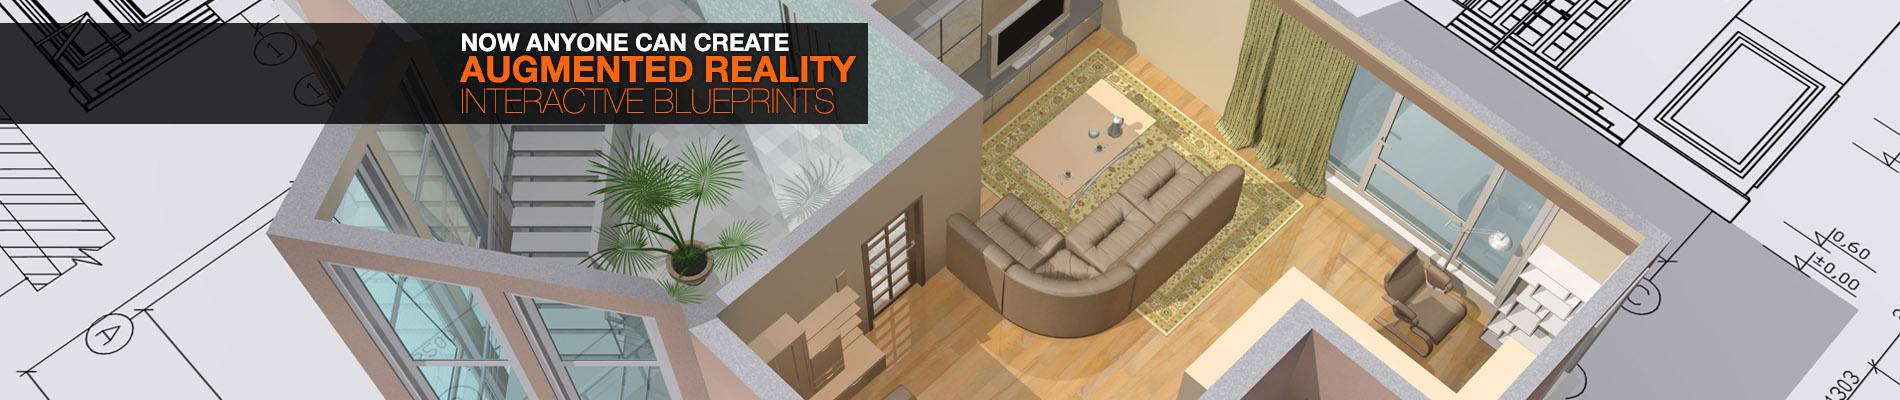 WakingApp-Virtual-reality11